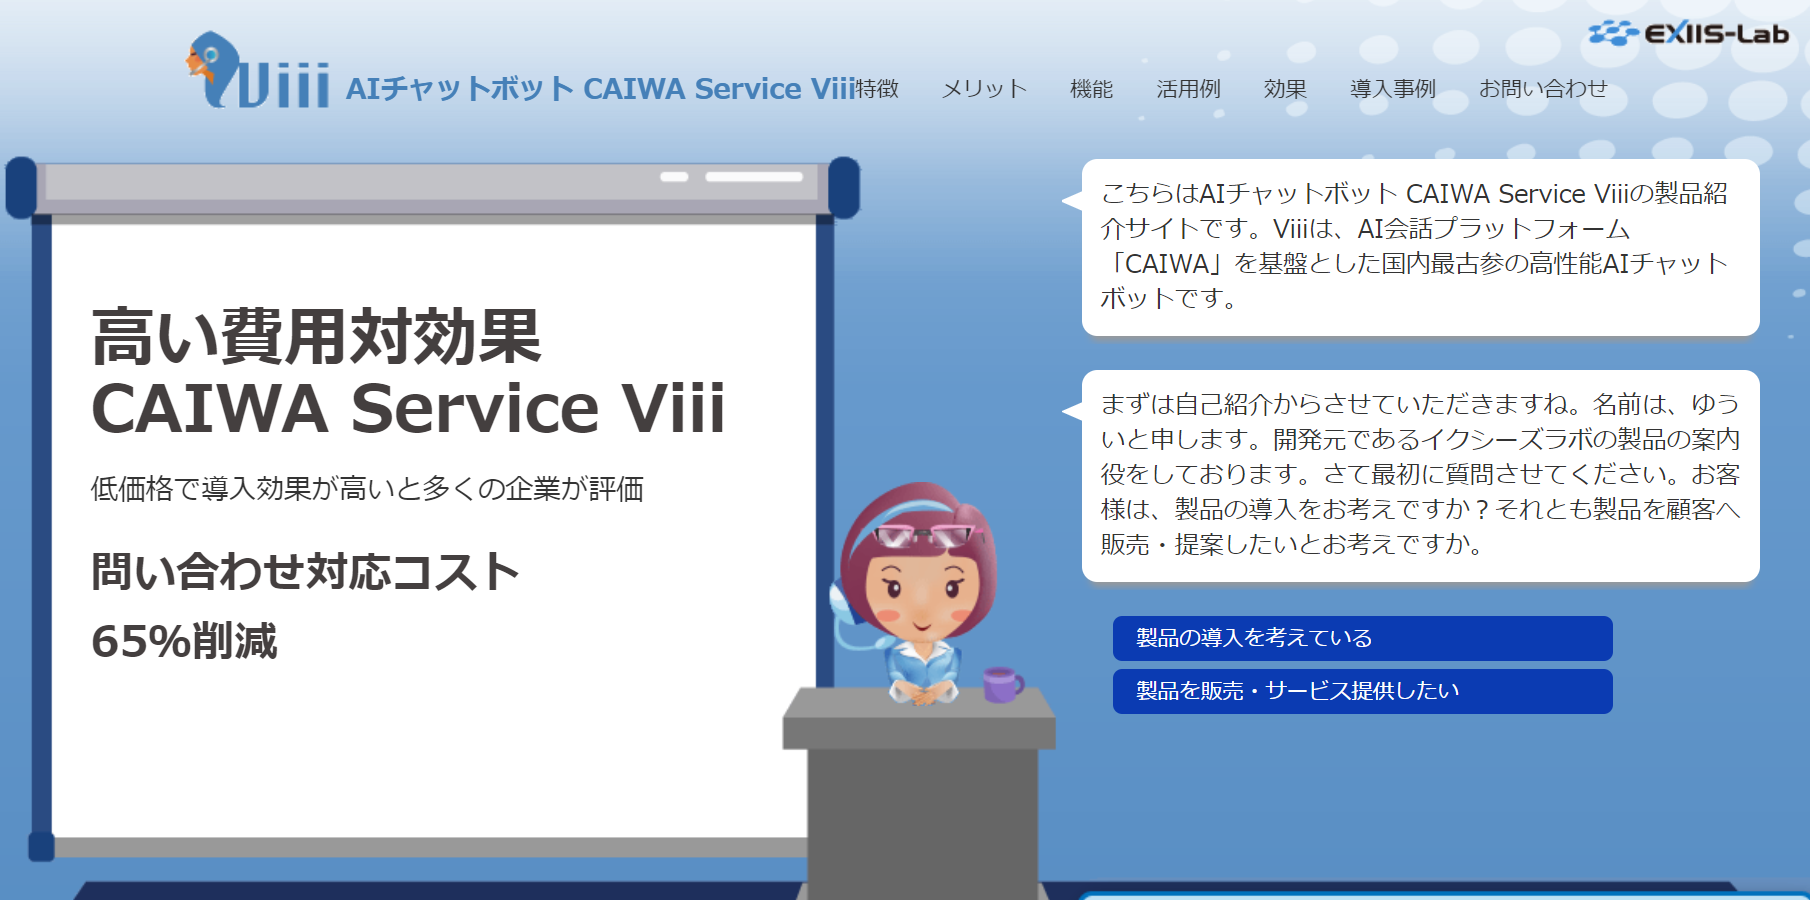 CAIWA Service Viii